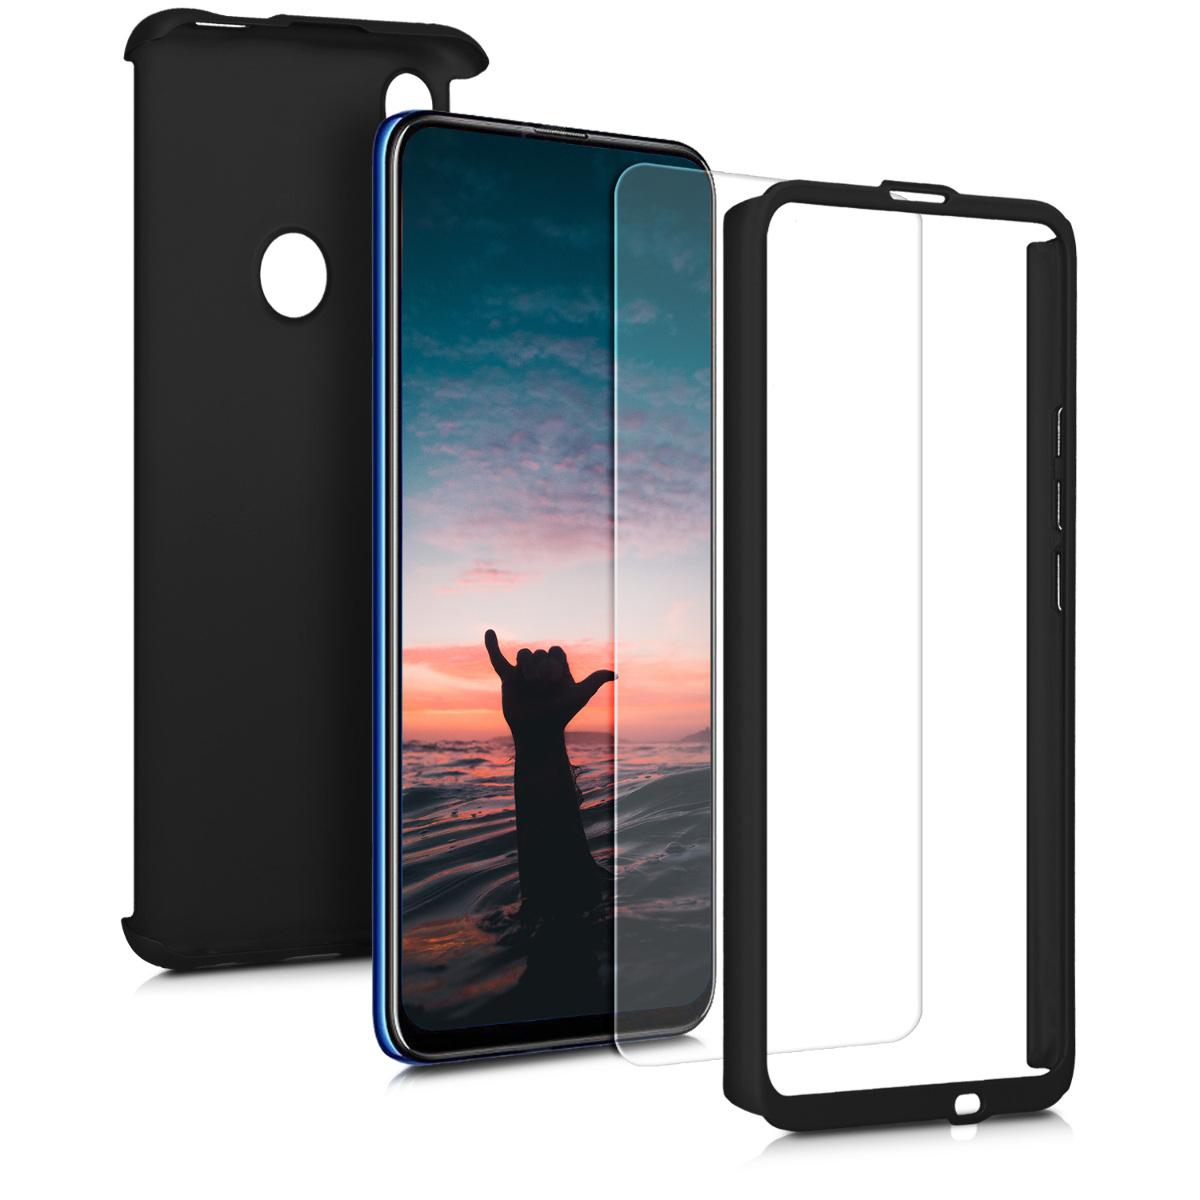 KW Θήκη Full Body Huawei P Smart Z & Tempered Glass  - Metallic Black (49367.68)